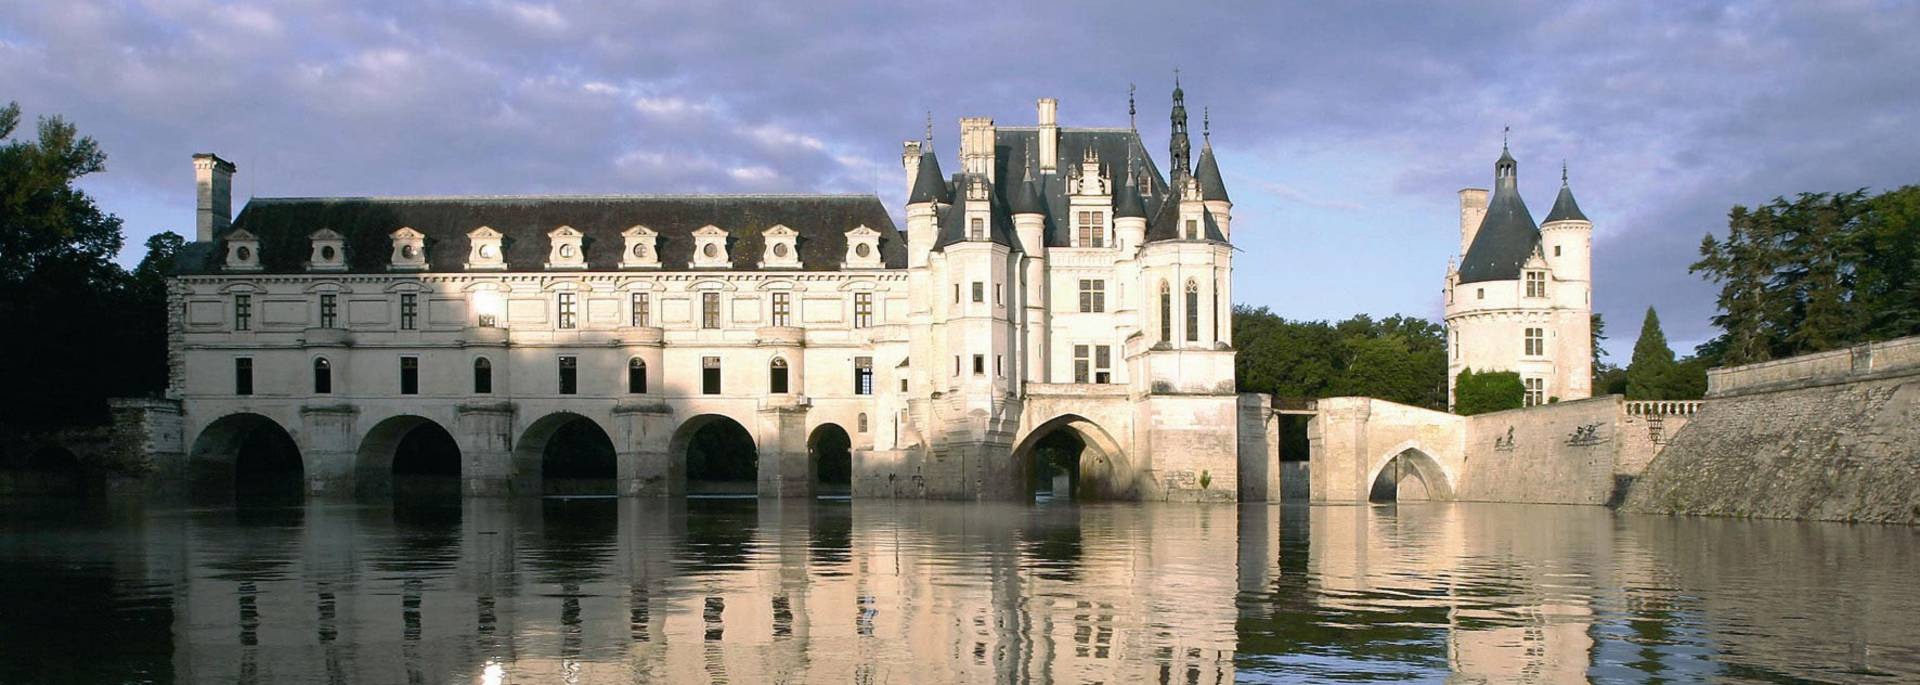 Schloss Chenonceau am Cher